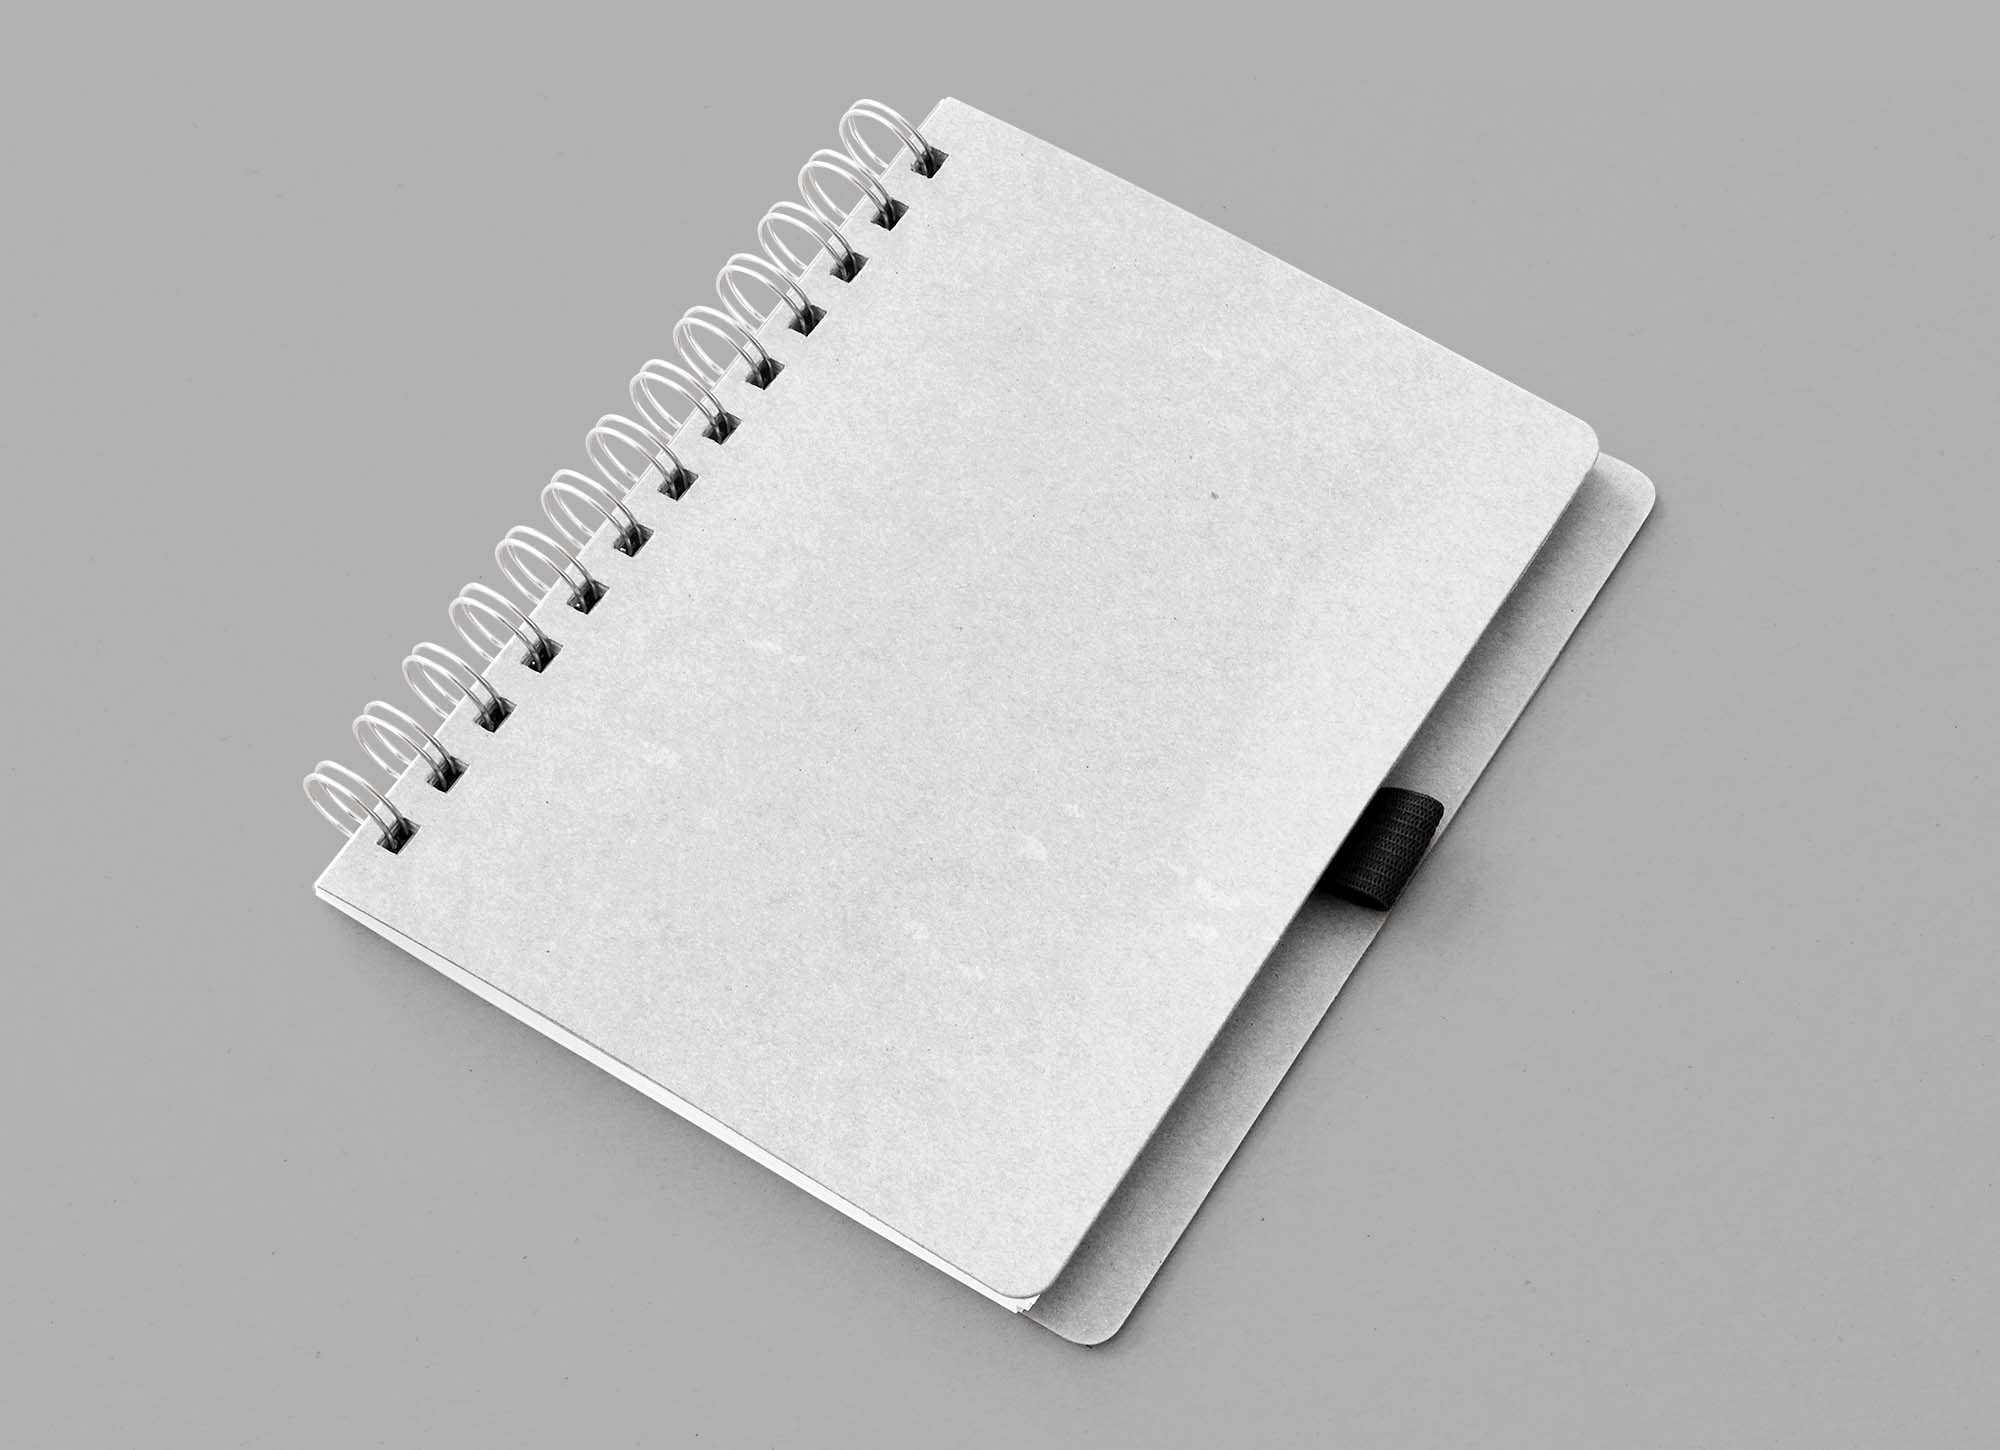 Clean Notebook Mockup 2